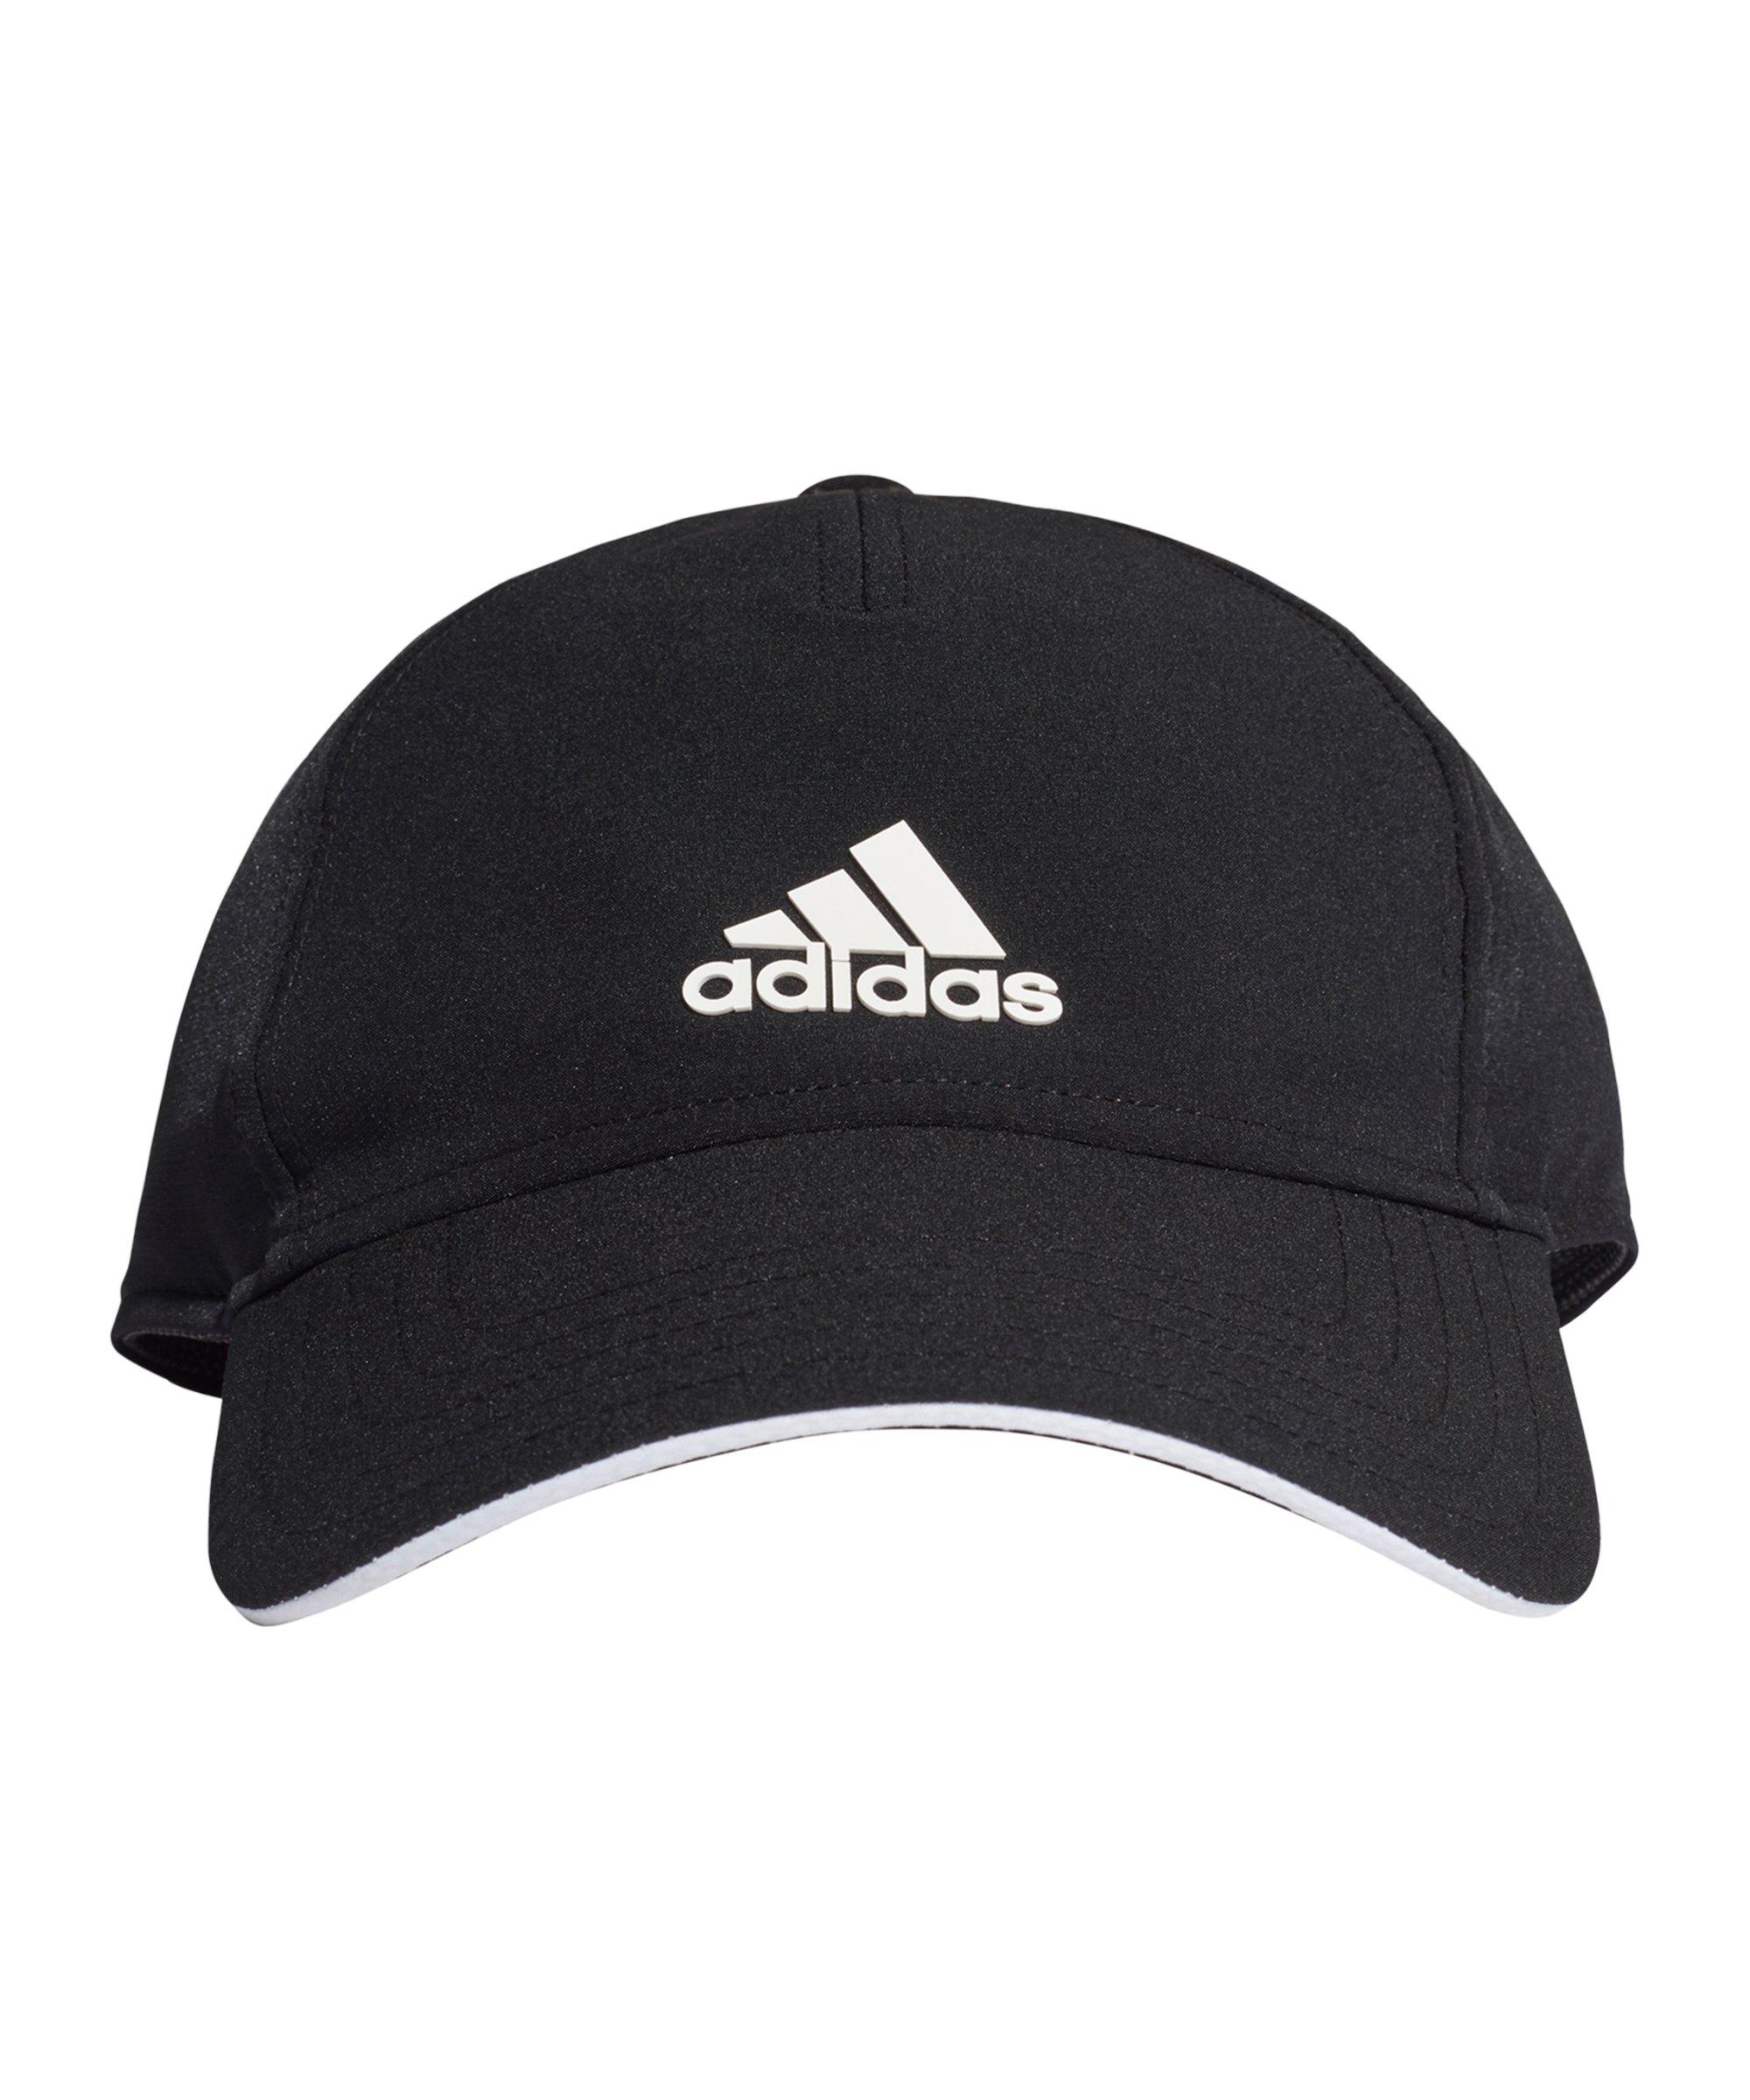 adidas Aeroready Baseball Cap Schwarz Weiss - schwarz